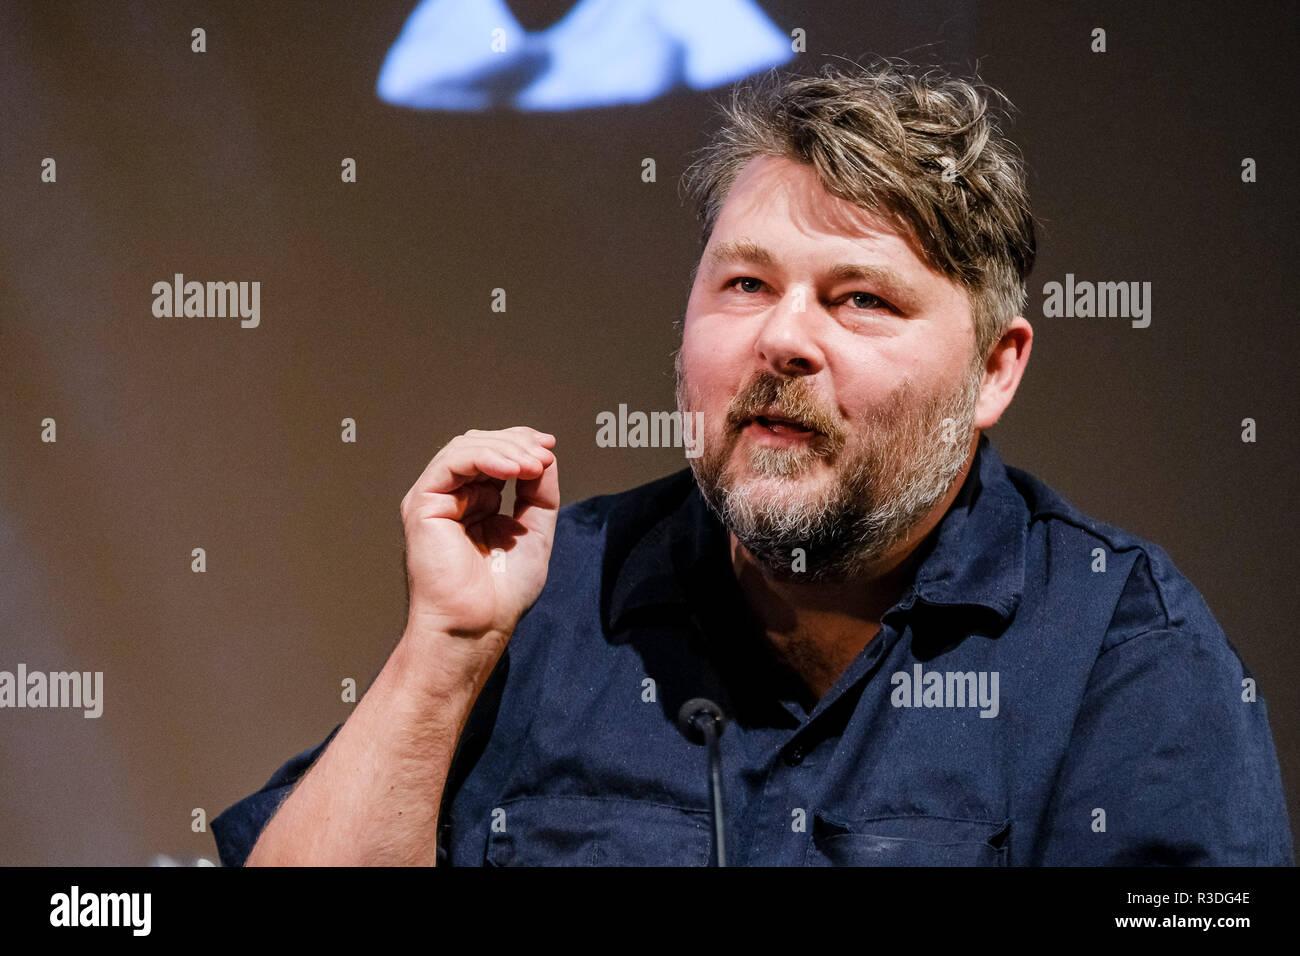 Filmemacher Ben Wheatley erscheint auf Mark Kermode Leben in 3D am Montag, den 19. November 2018 BFI Southbank, London statt. Im Bild: Ben Wheatley. Stockbild